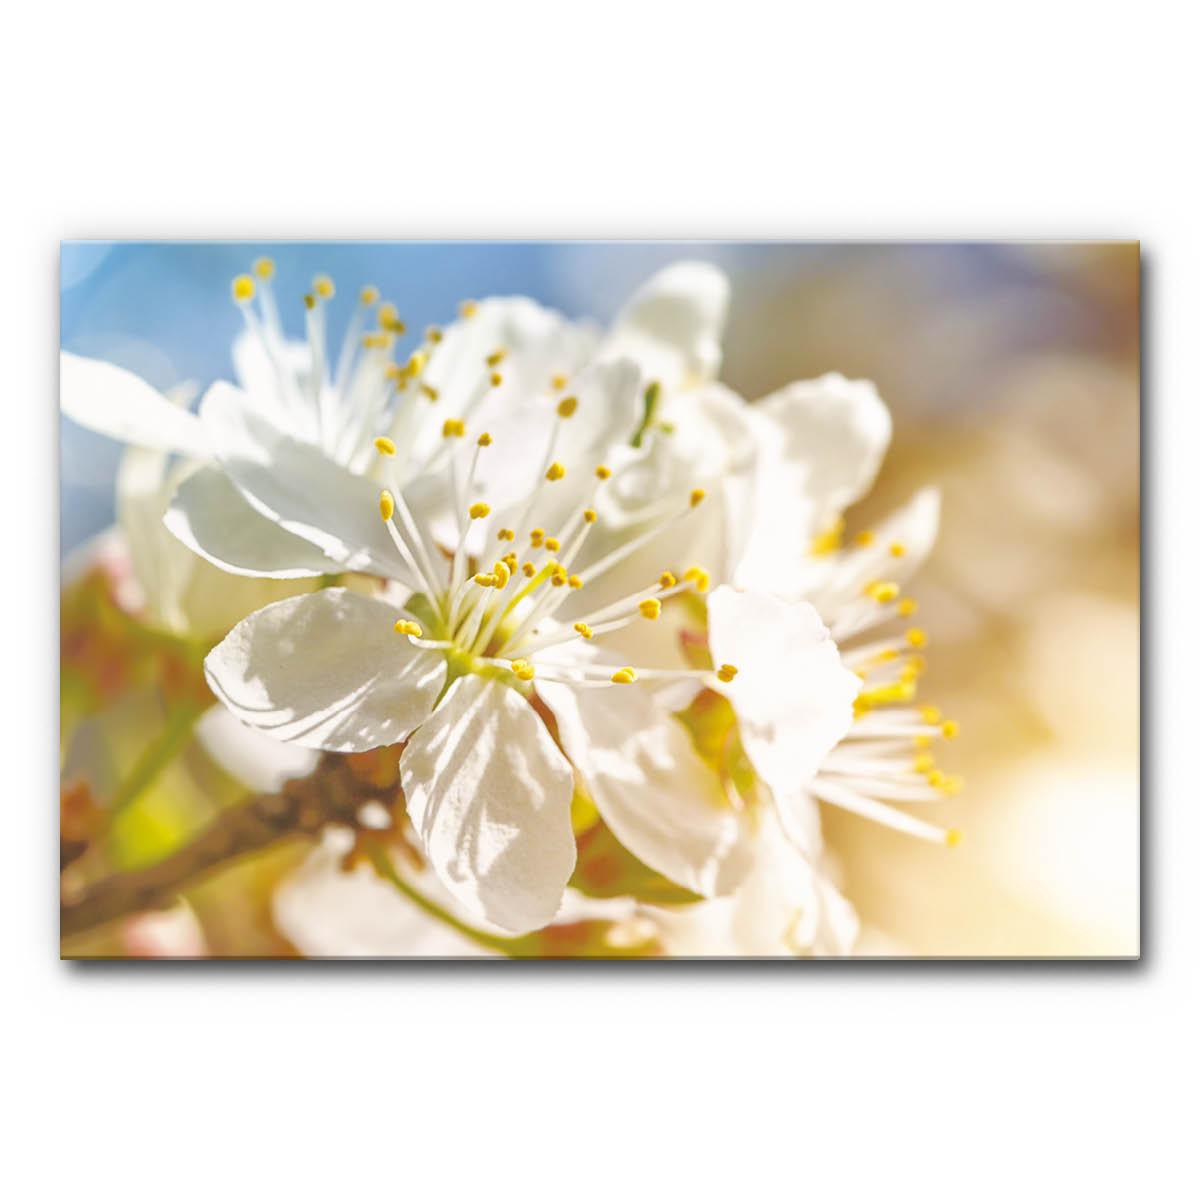 Akustikbild Kirschblüte 2 im Format 120x80 cm